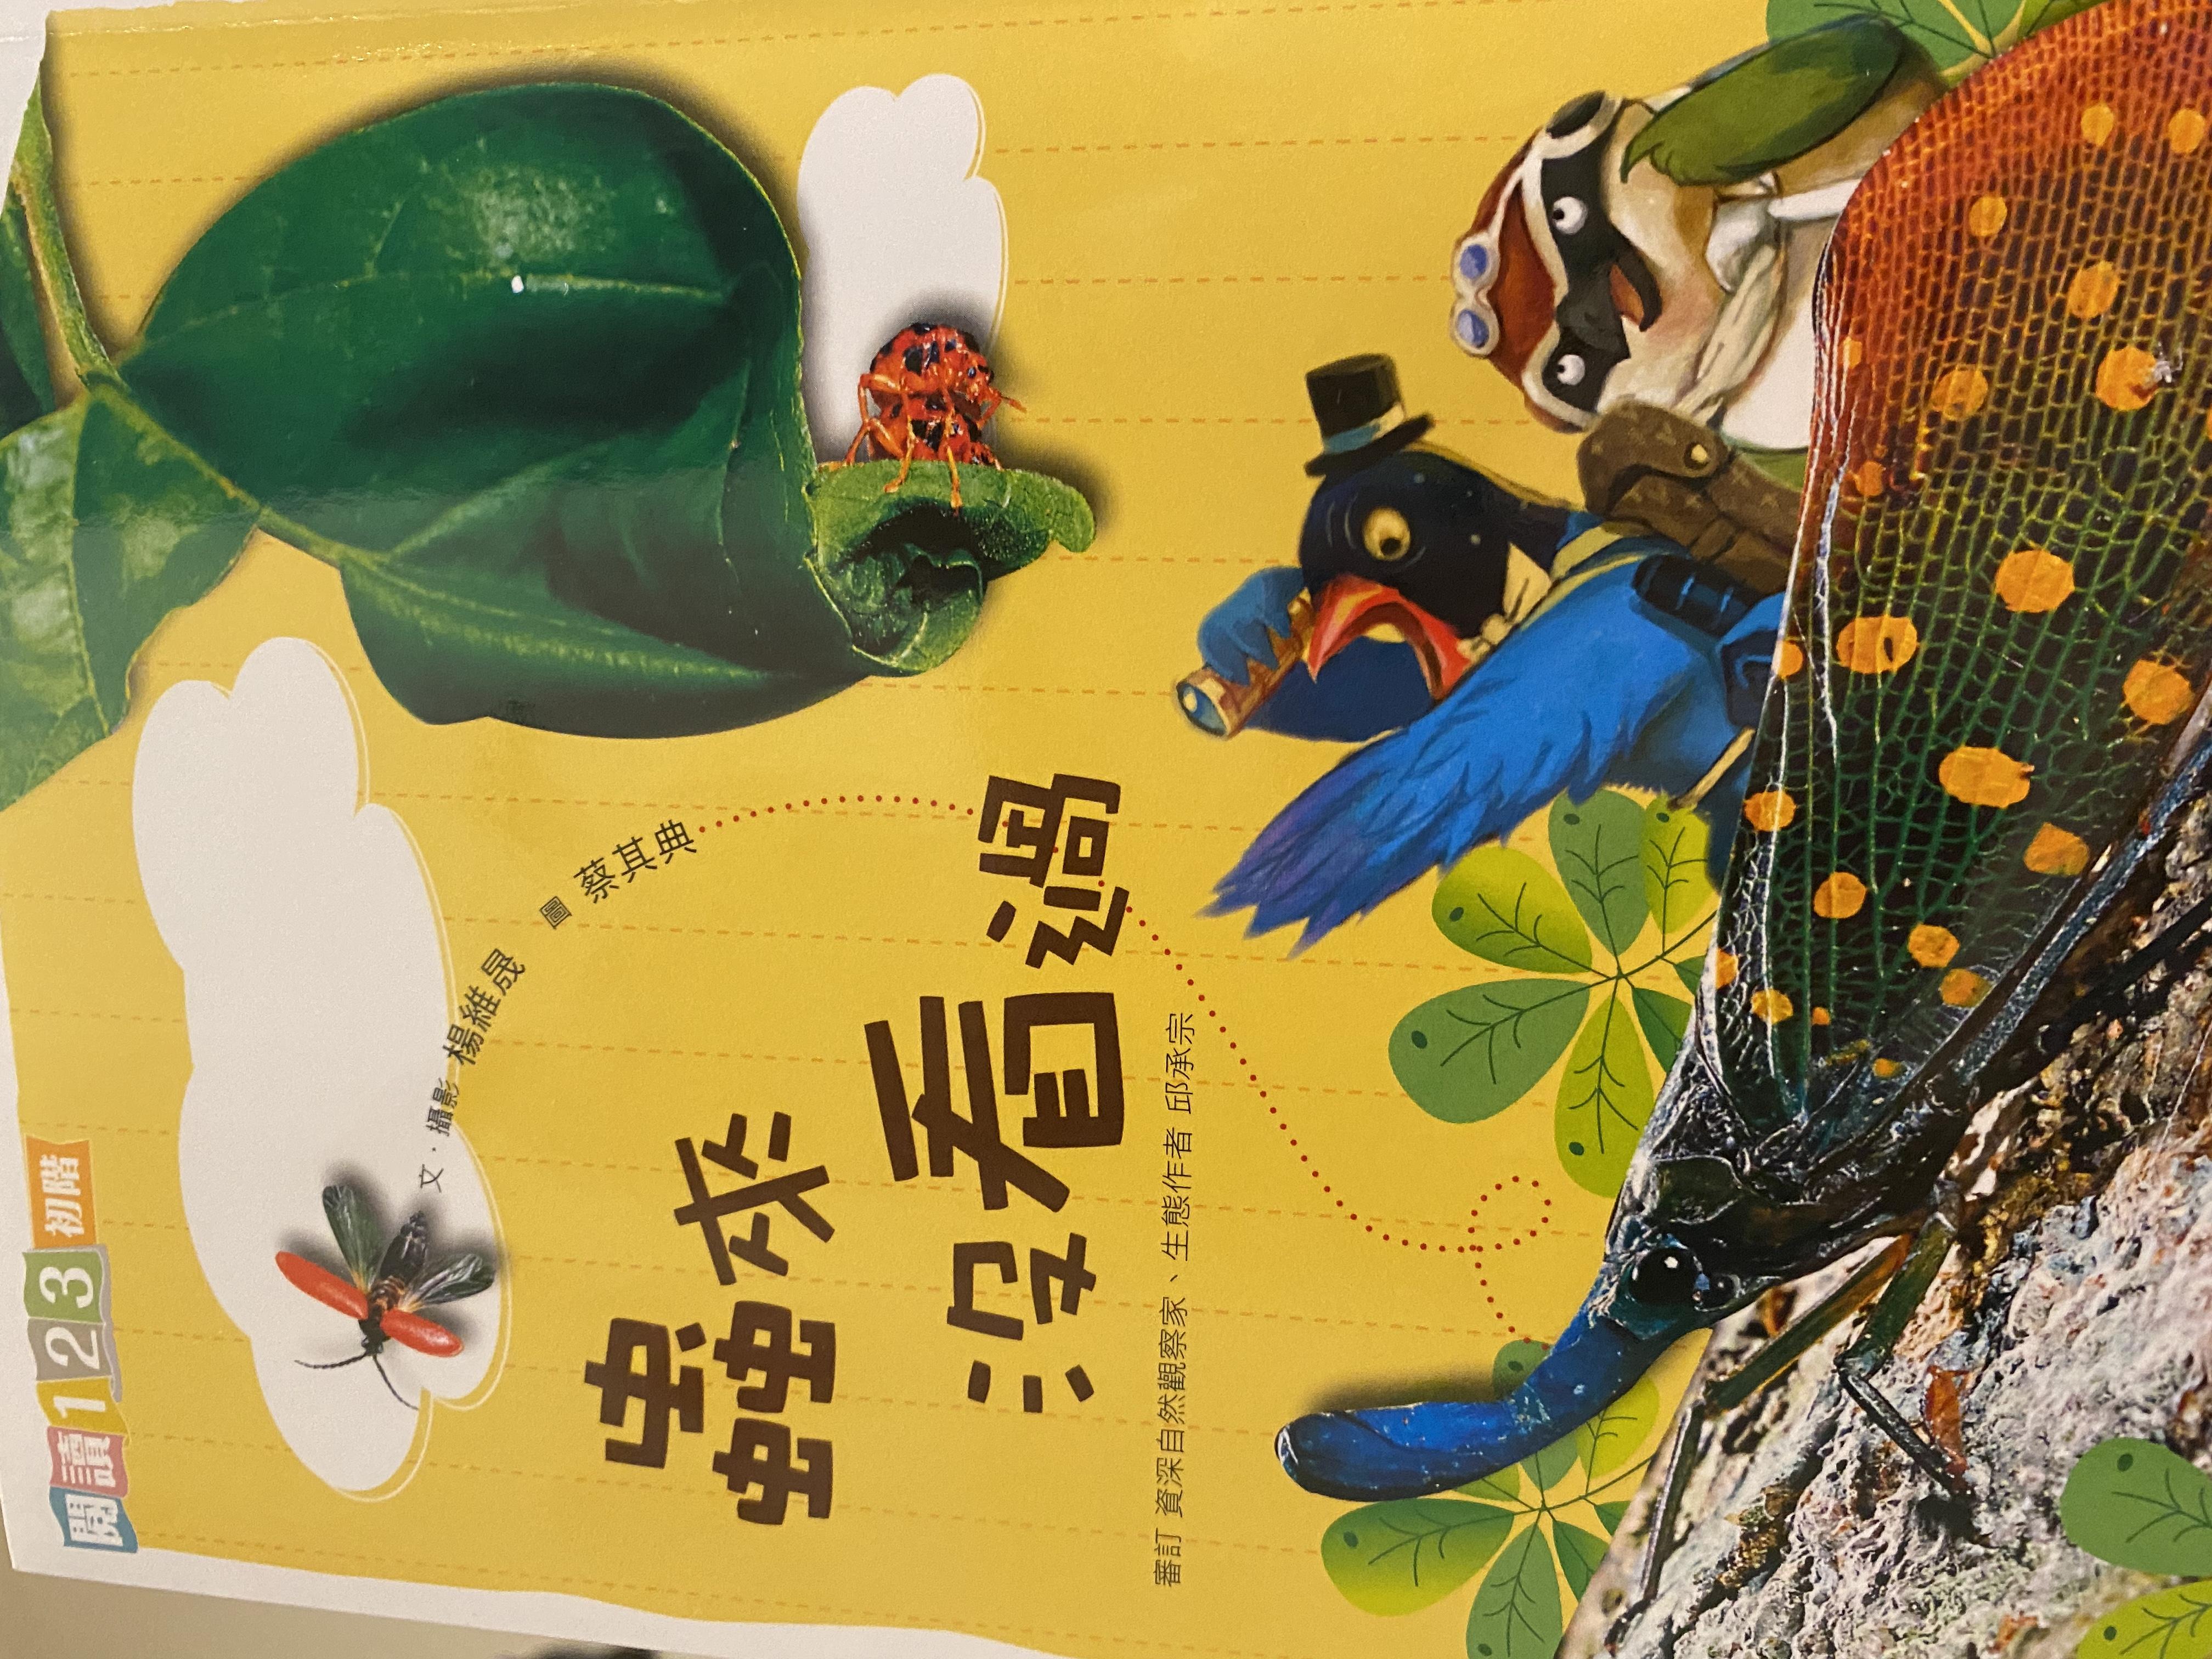 S3-194/ 1&2 / 蟲來沒看過/ 文 攝影 楊維晟/ 圖 蔡其典/ 親子天下